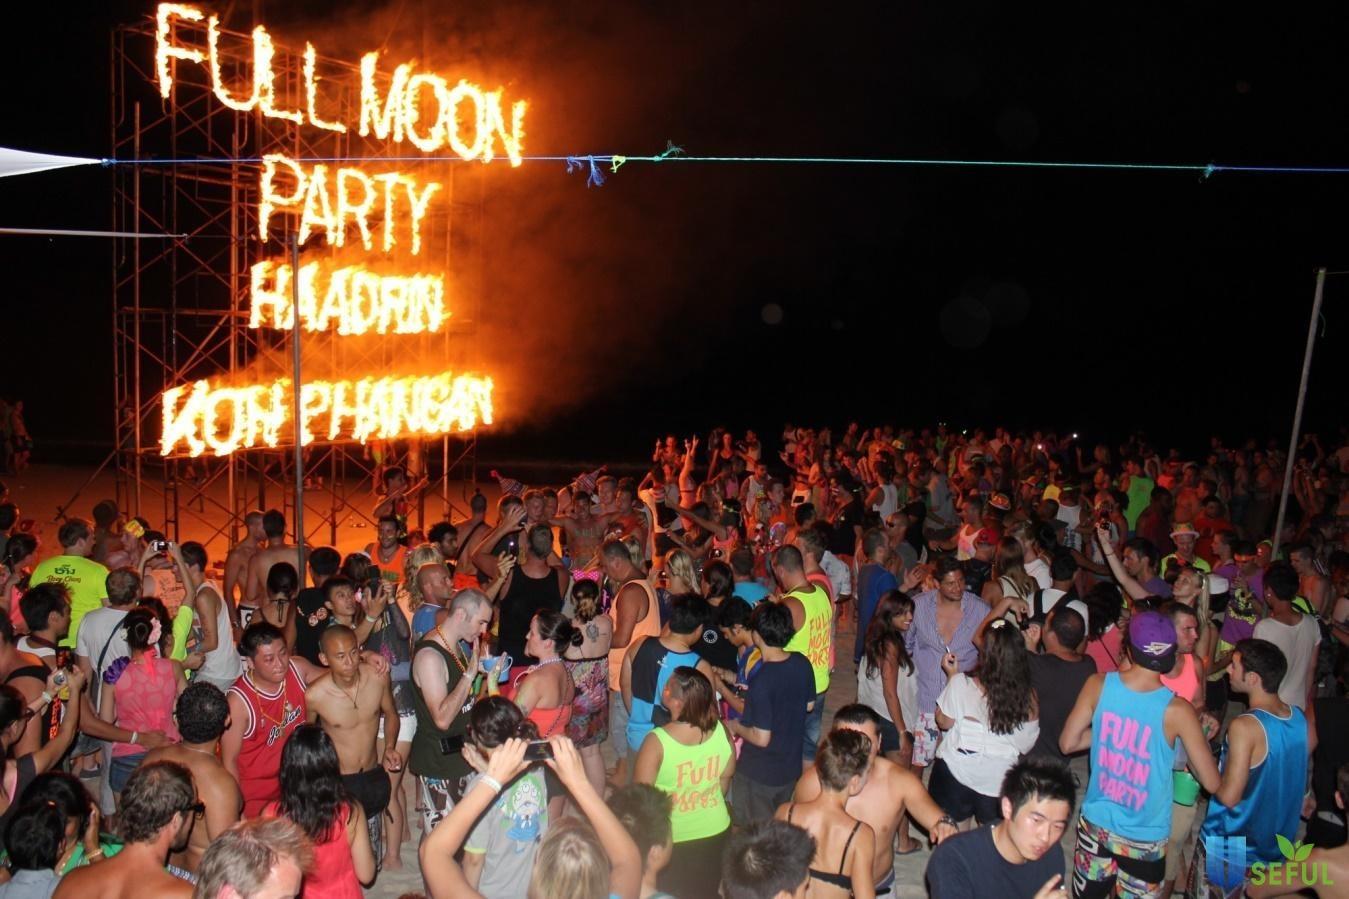 Tiệc Full Moon Party ở Haad Rin